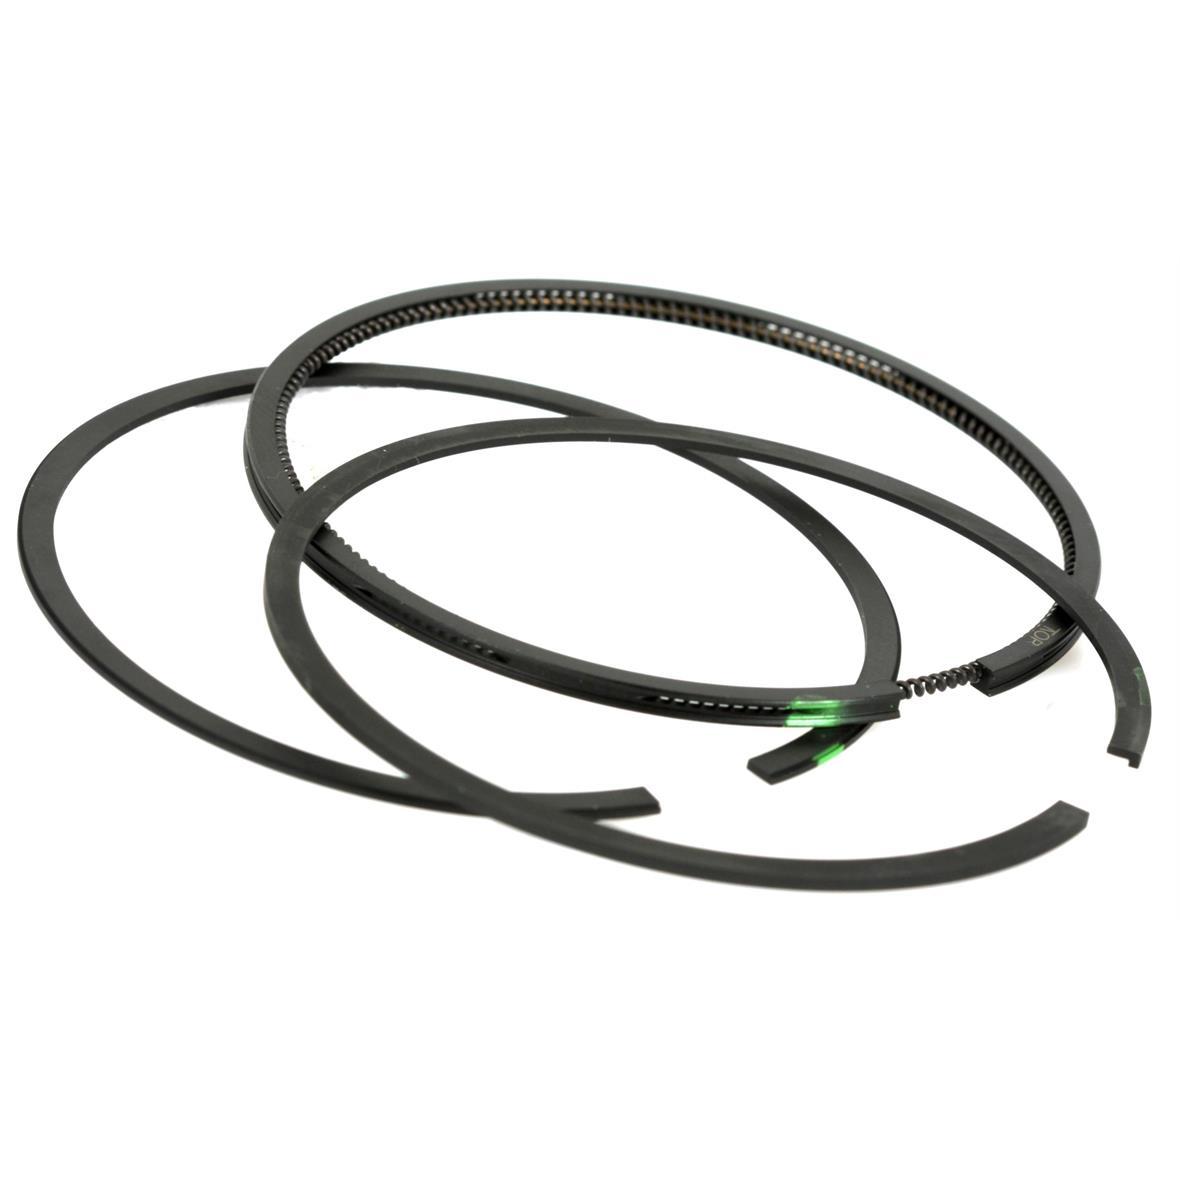 Product Image for 'Piston Ring KitTitle'